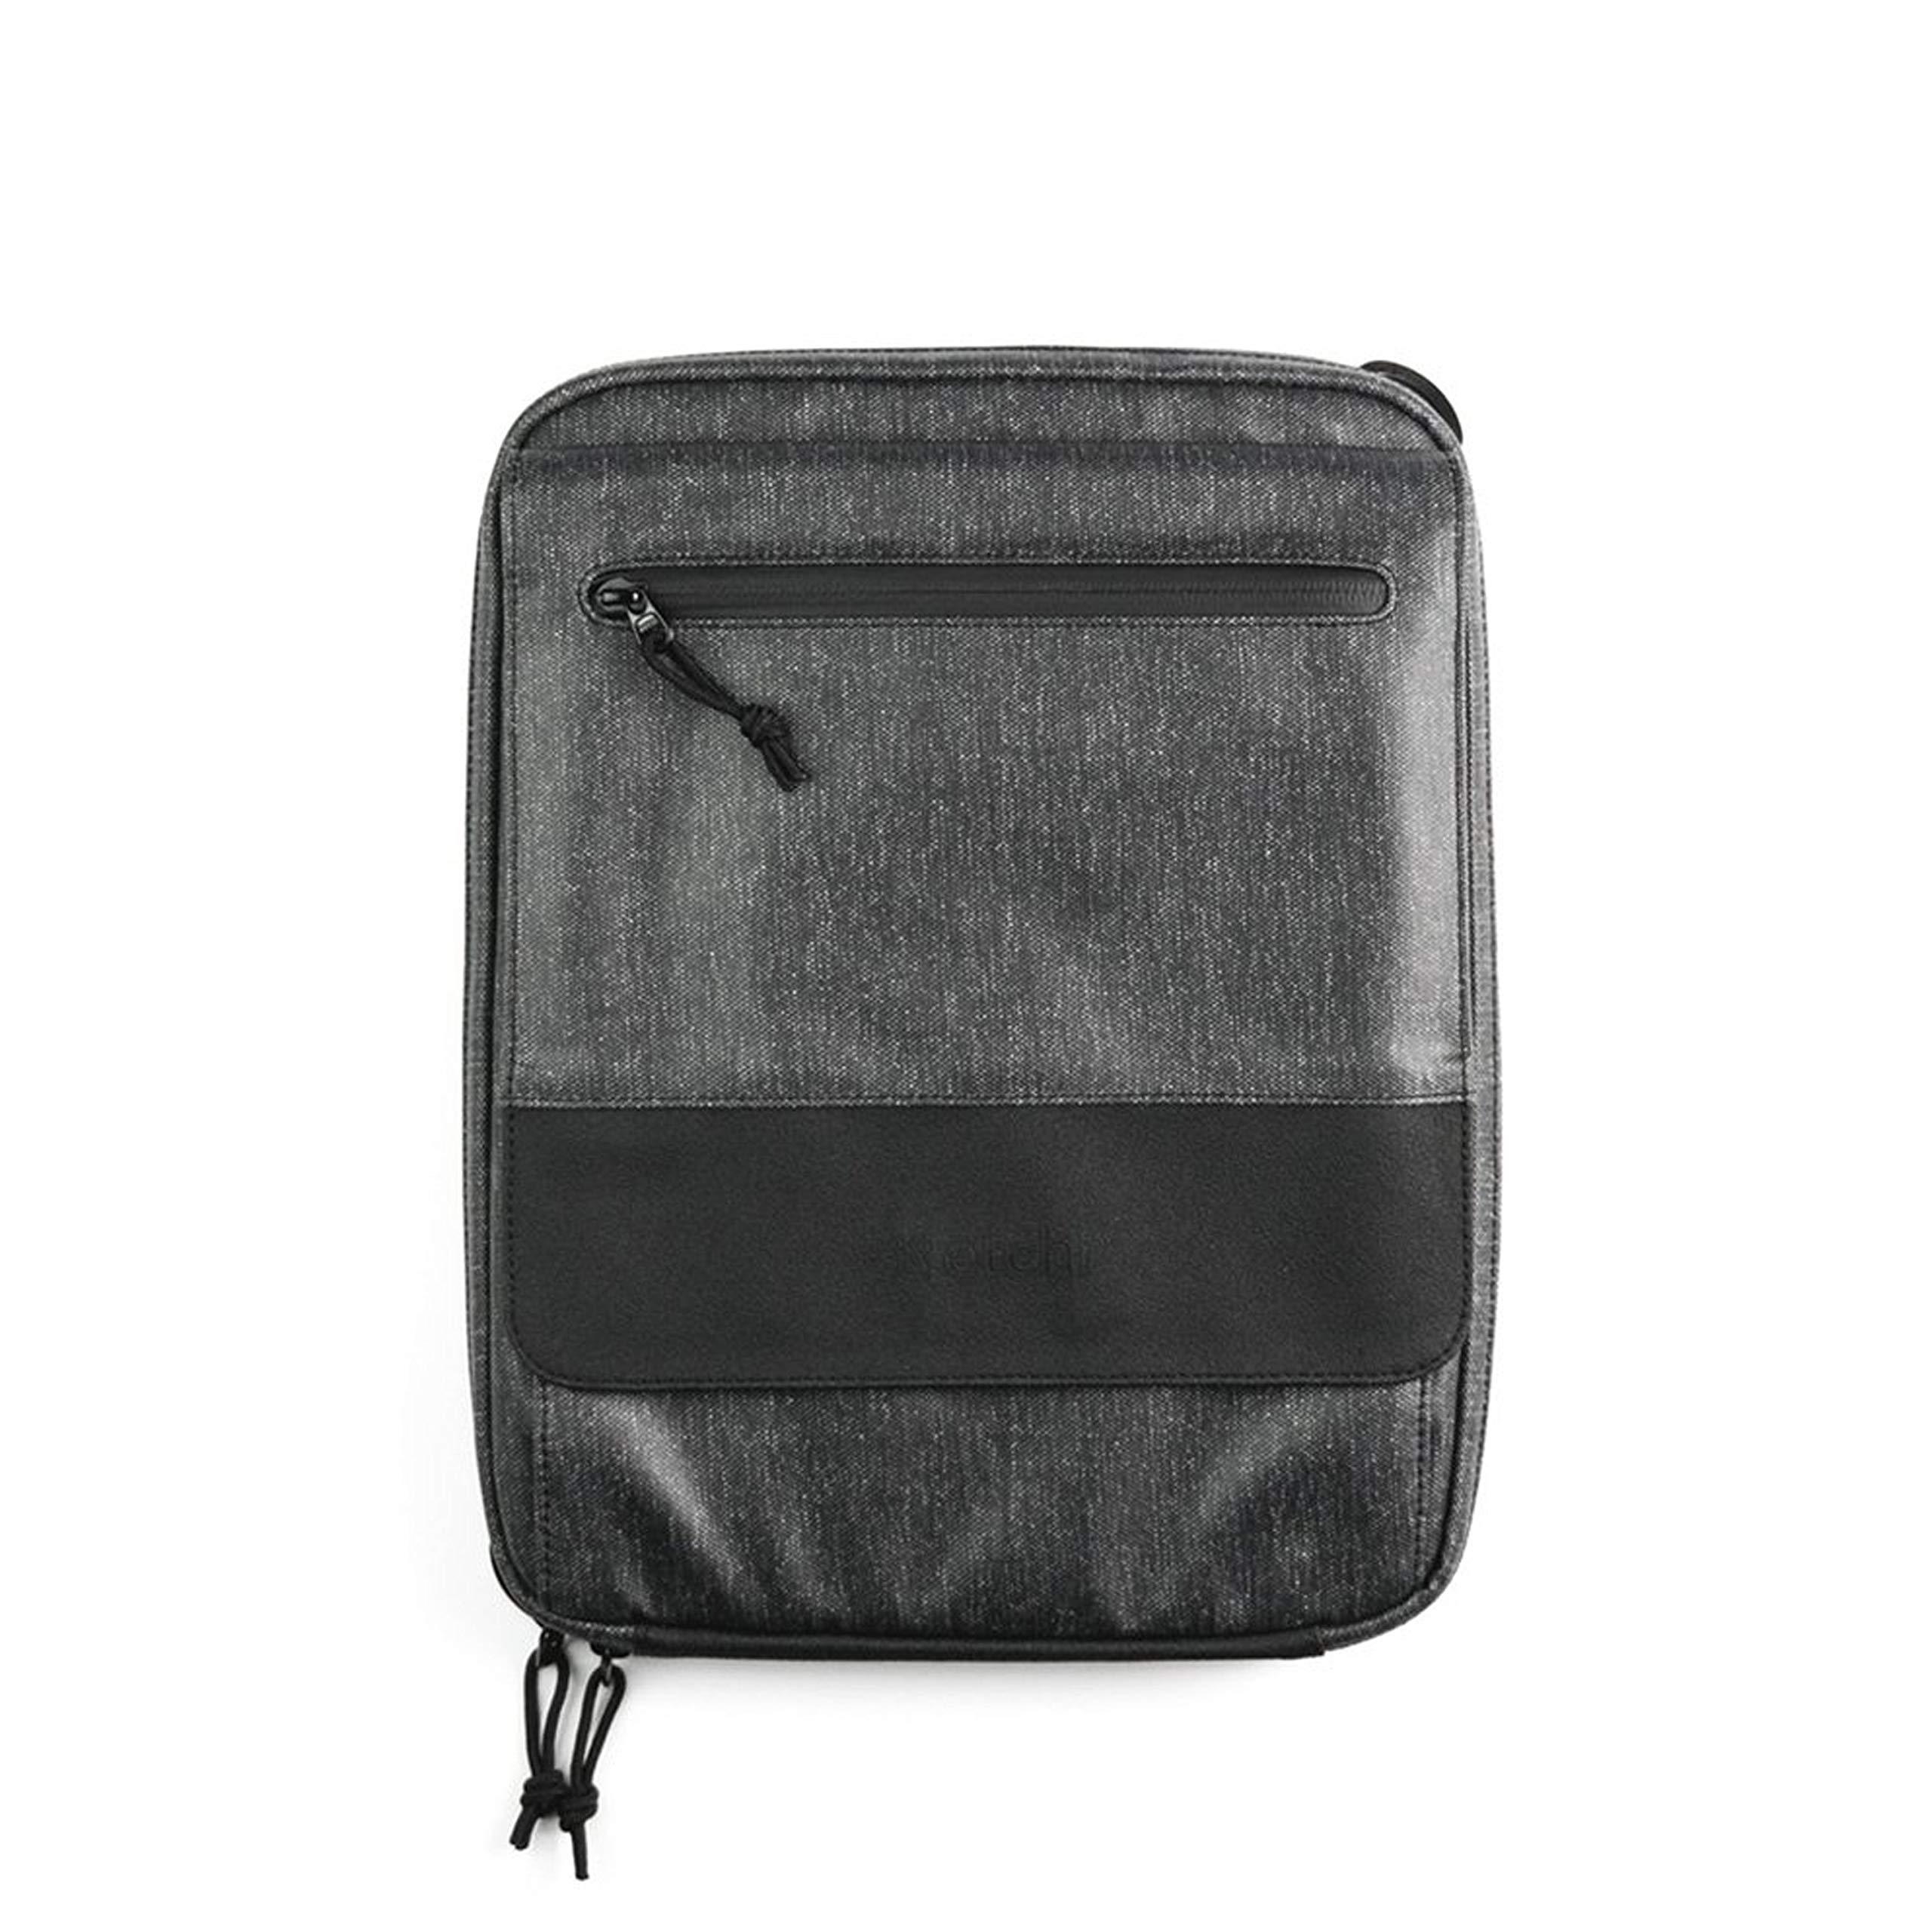 ETCHR Slate Mini Satchel - 2 in 1 Art Portfolio Case and Small Messenger Bag for Art Supplies - Multipurpose Weatherproof Travel Art Bag for Adults and Teens - Tripod Mountable Art Portfolio Bag